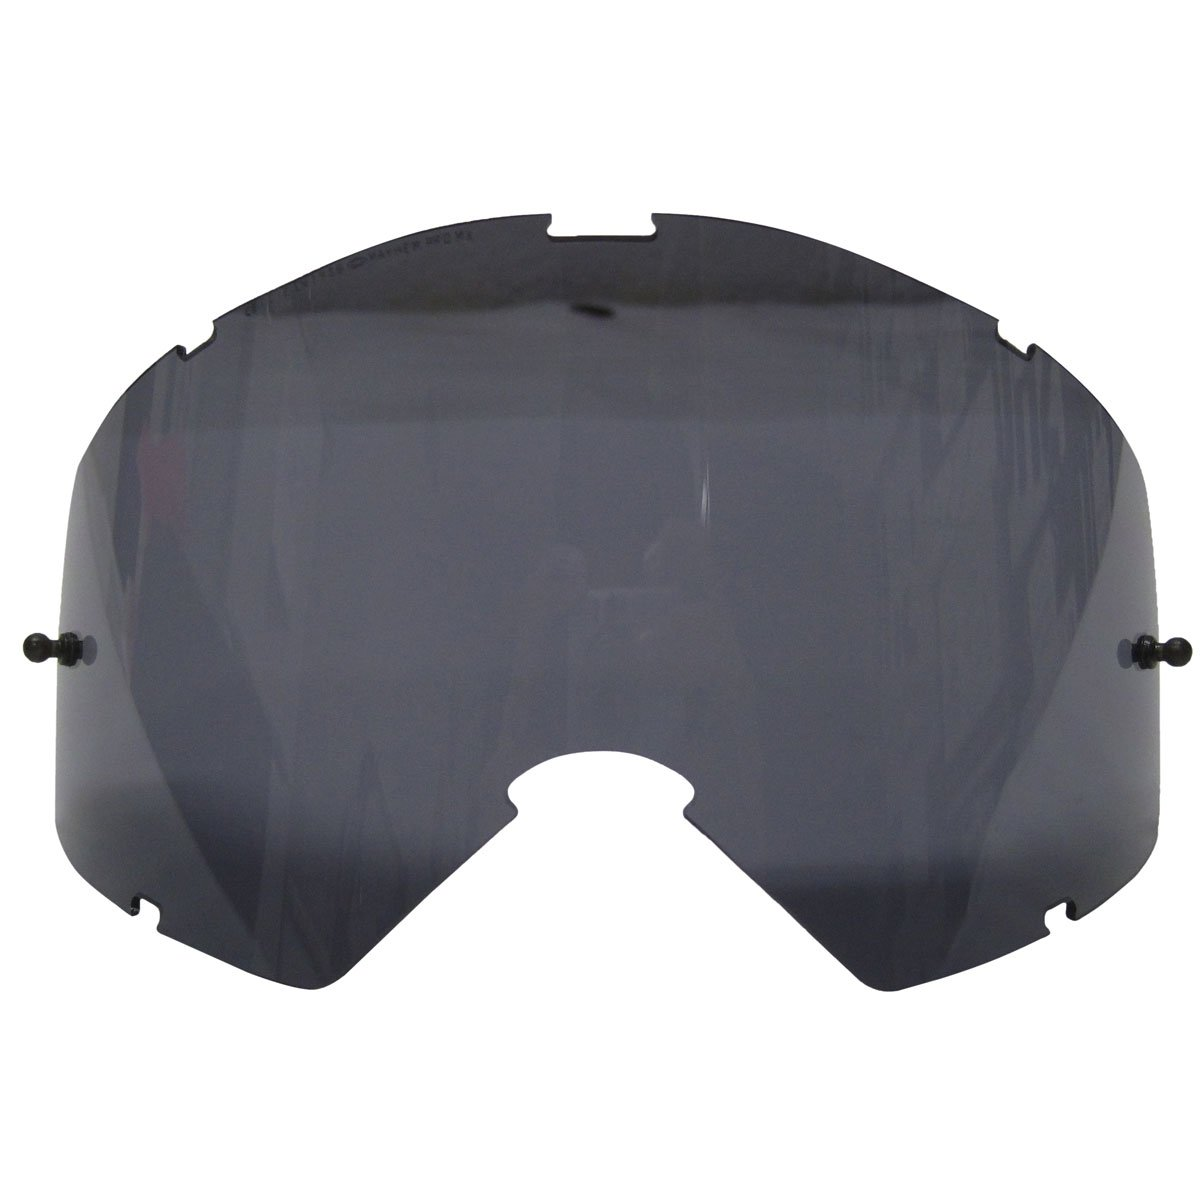 Oakley Mayhem Pro Replacement Lens (Dark Grey)